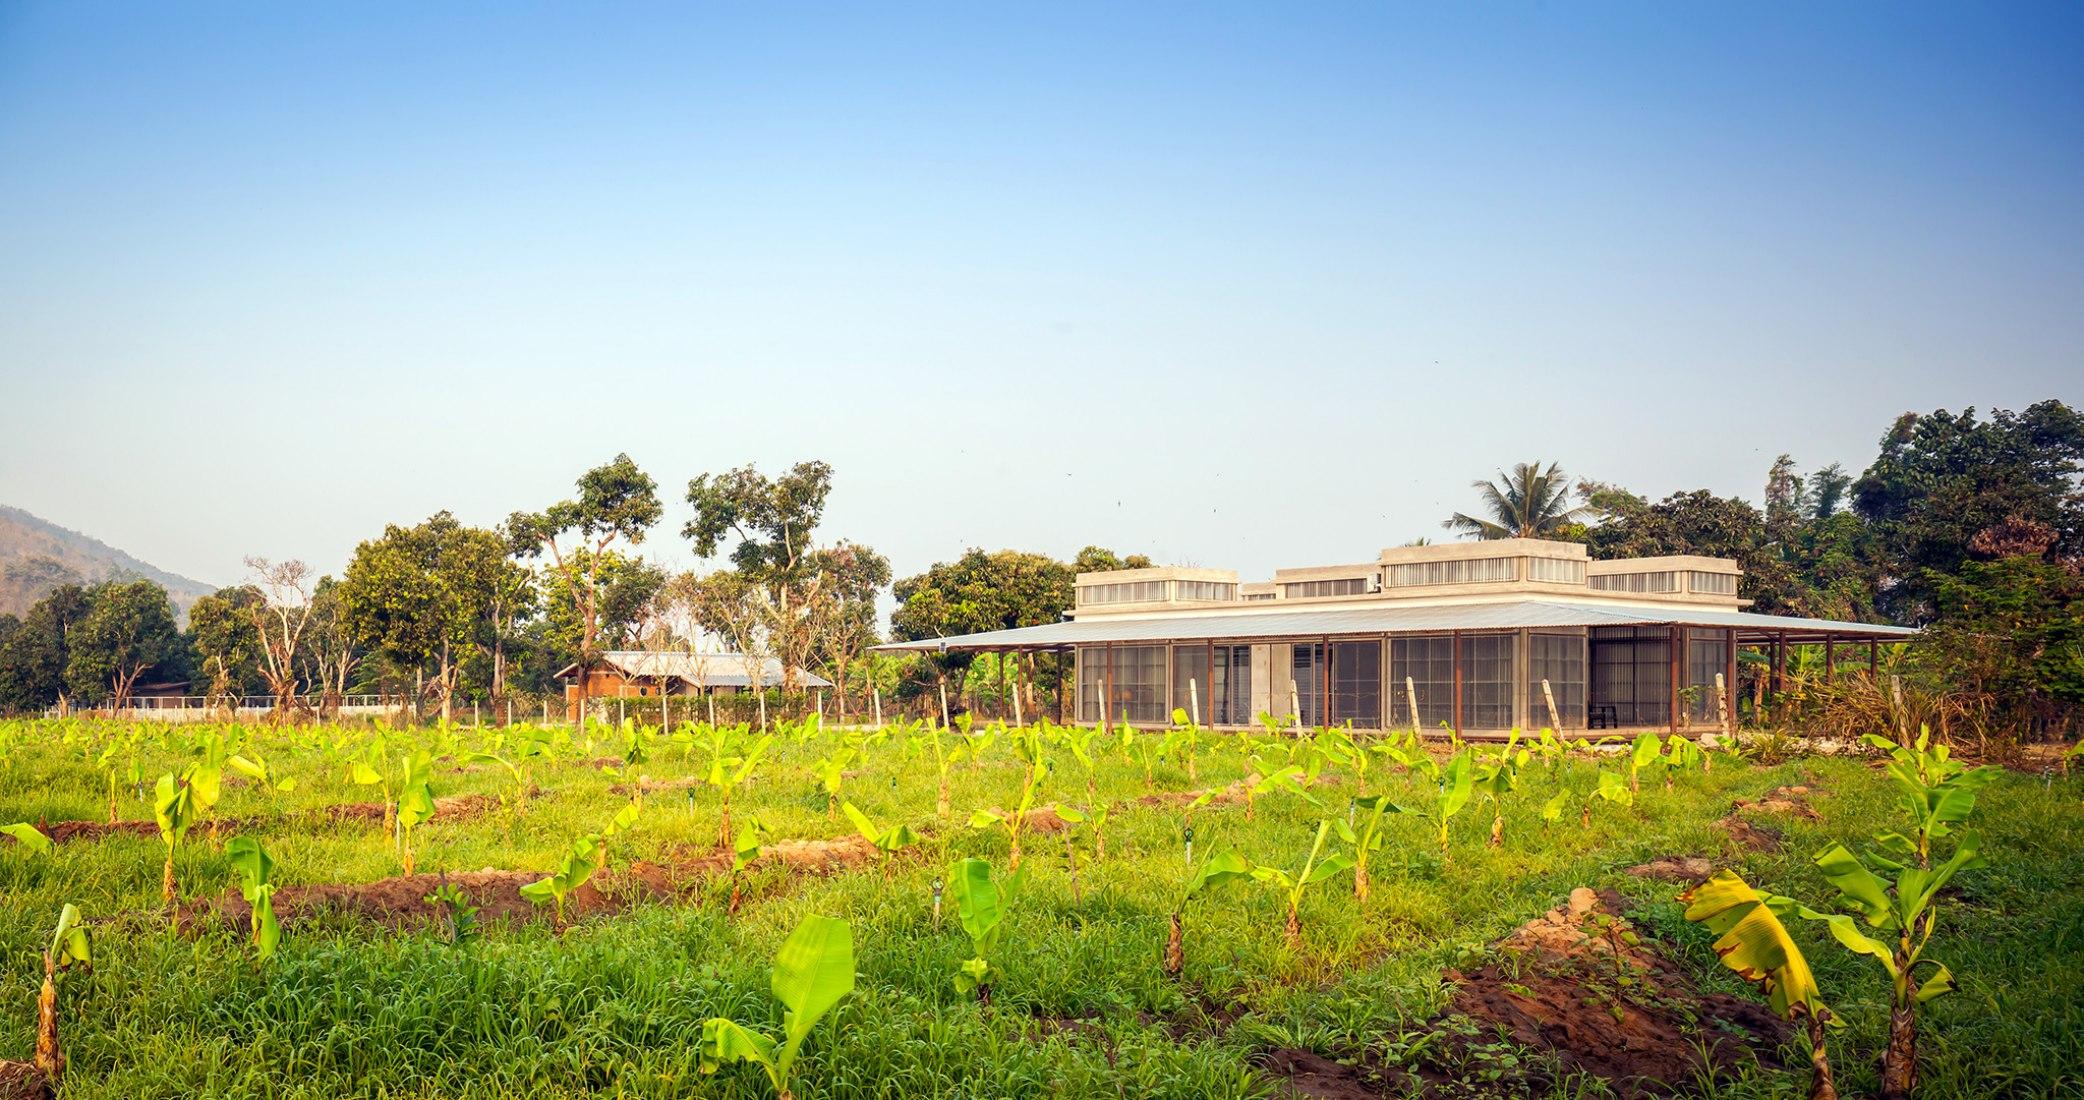 Kaeng Krachan Library by Junsekino Architect and Design. Photograph by Spaceshift Studio